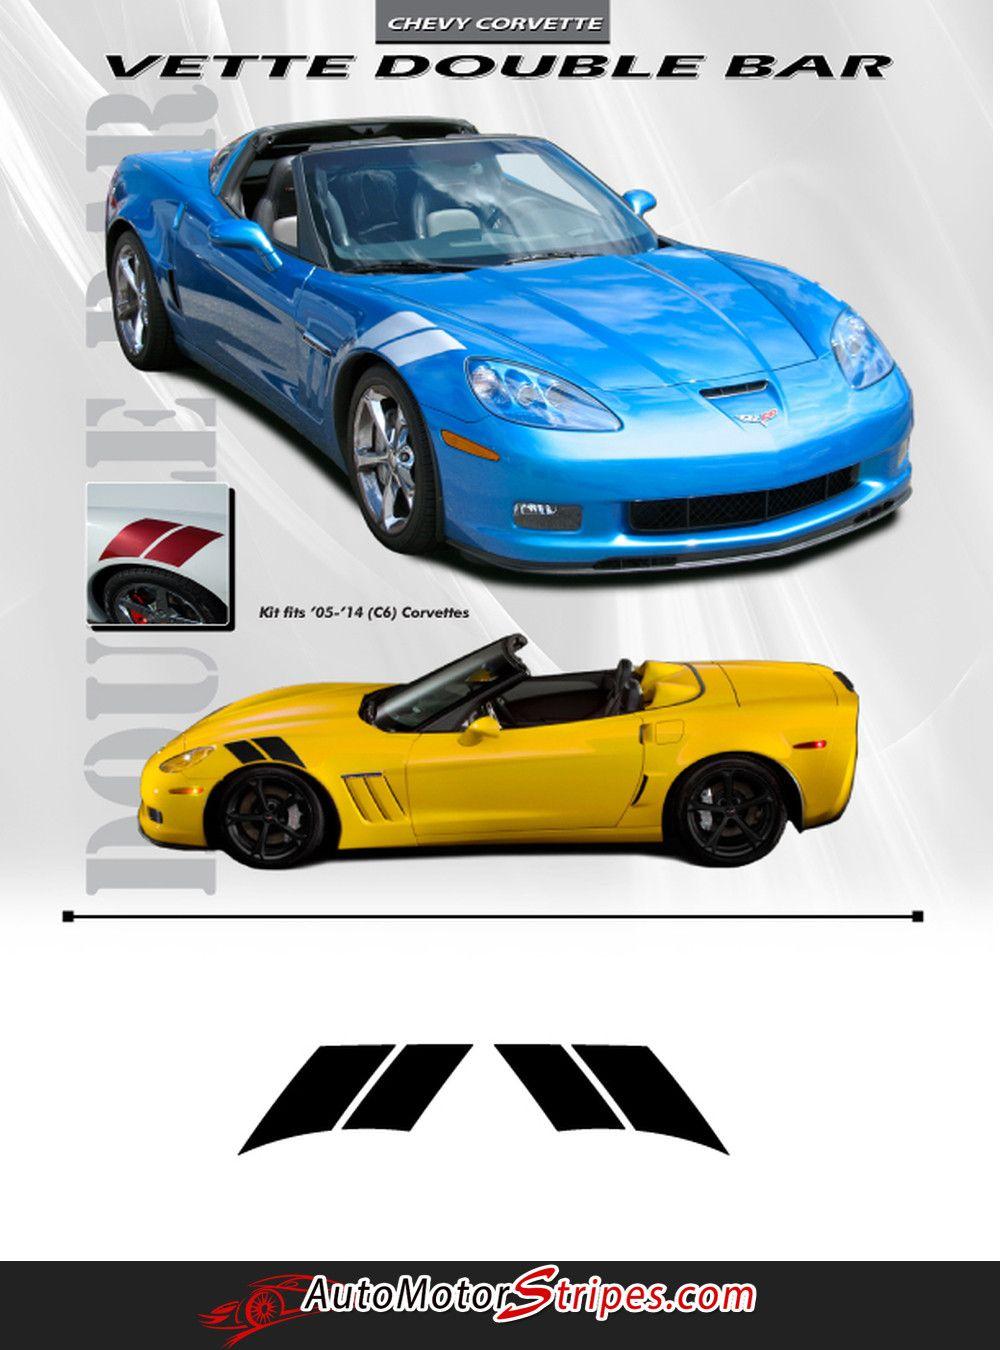 2005 2006 2007 2008 2009 2010 20112012 2013 Corvette C6 Hash Marks Decal Stripes